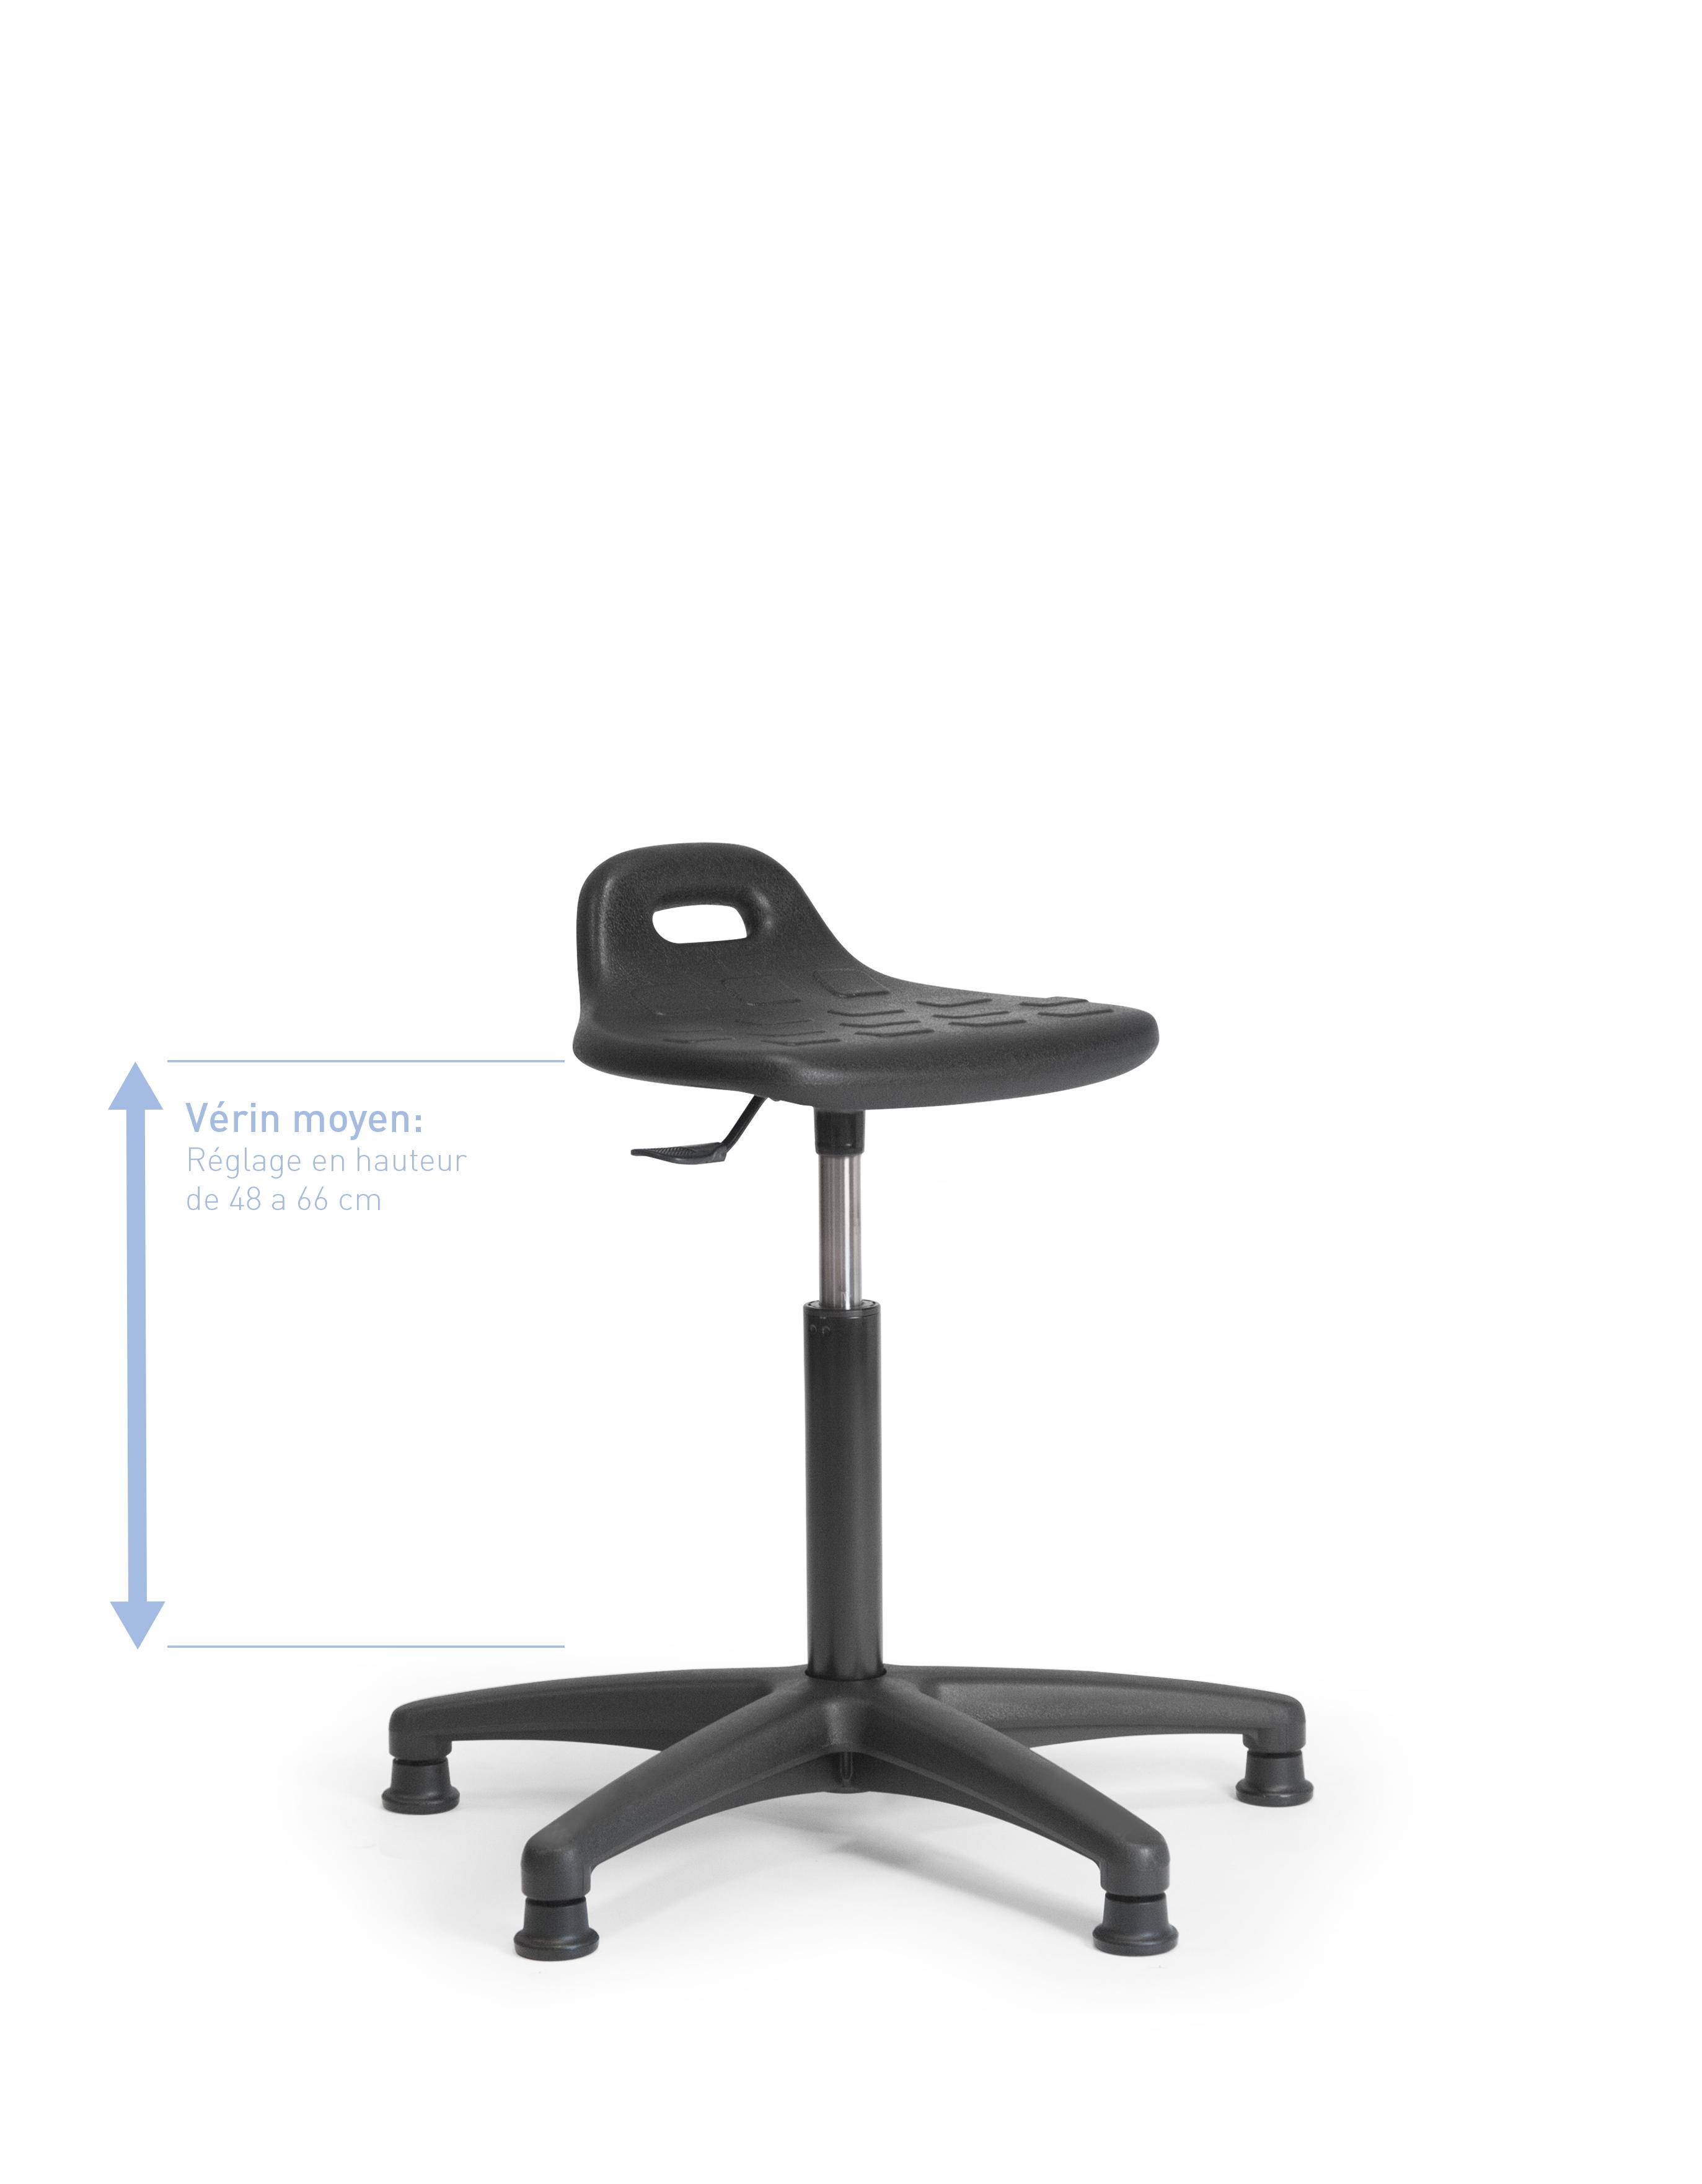 assis debout assis debout assis debout atelier laboratoire chaise atelier si ges et compagnie. Black Bedroom Furniture Sets. Home Design Ideas